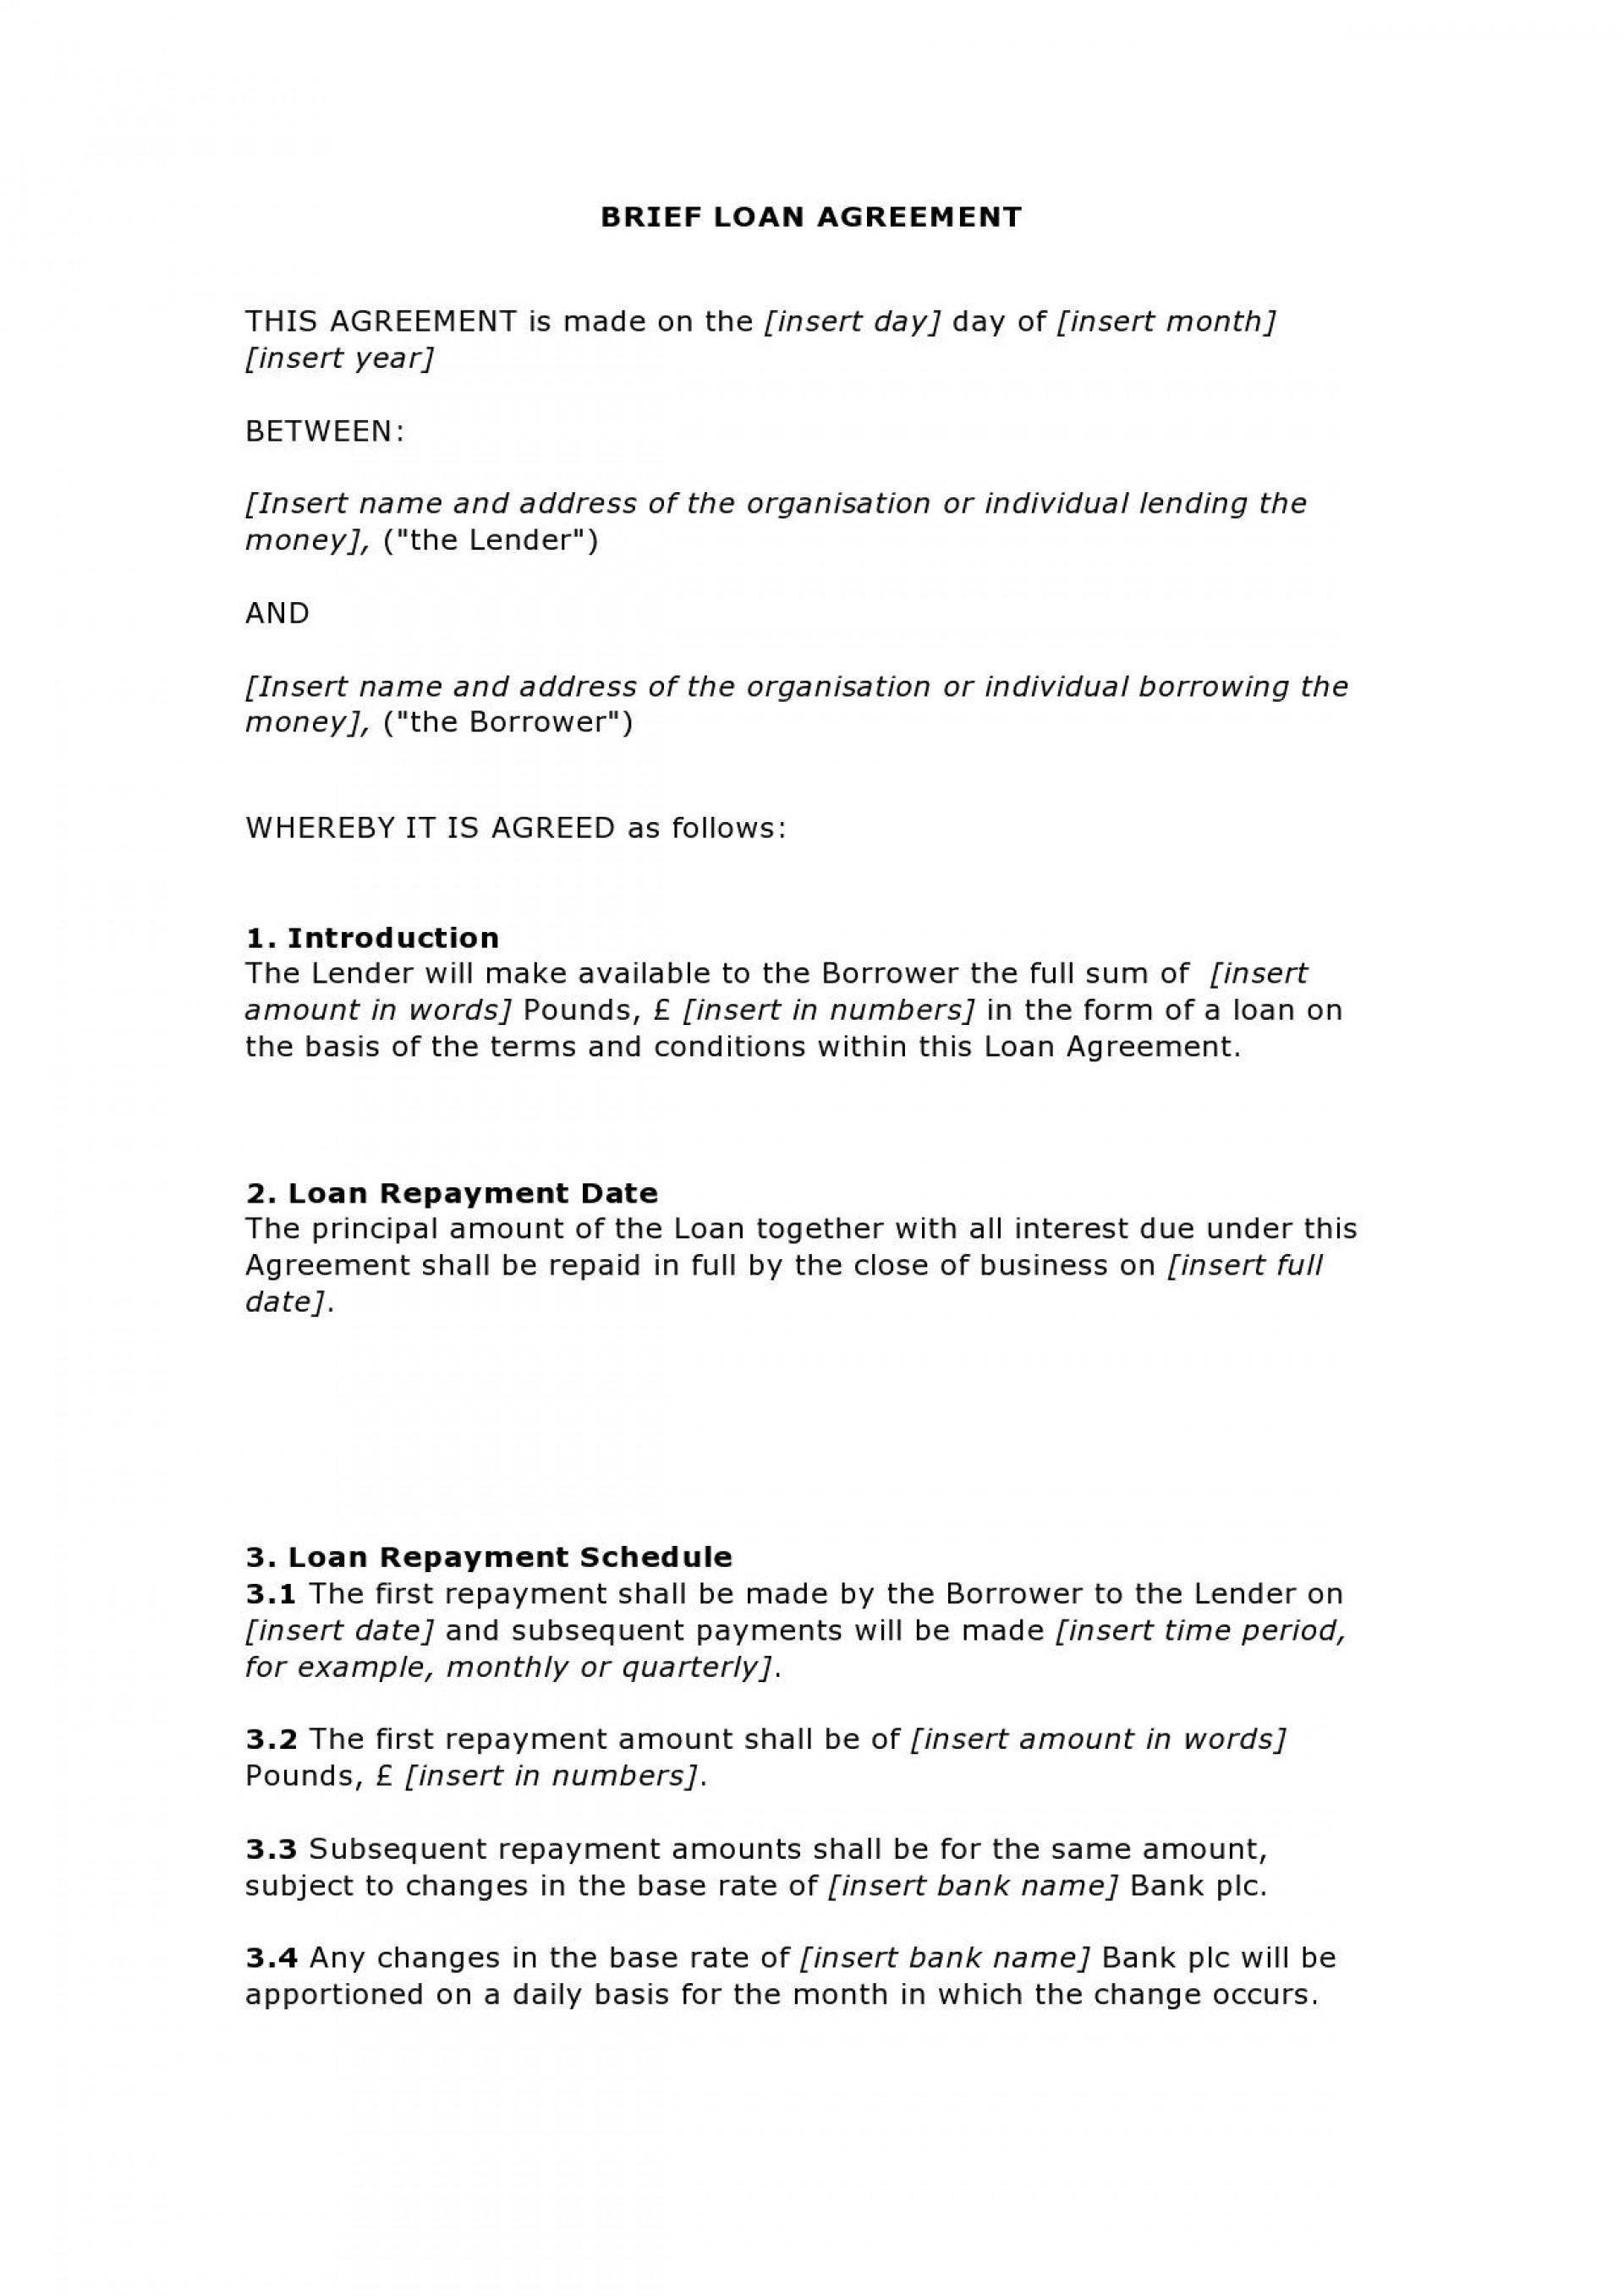 003 Unforgettable Family Loan Agreement Template Uk Free Idea 1920